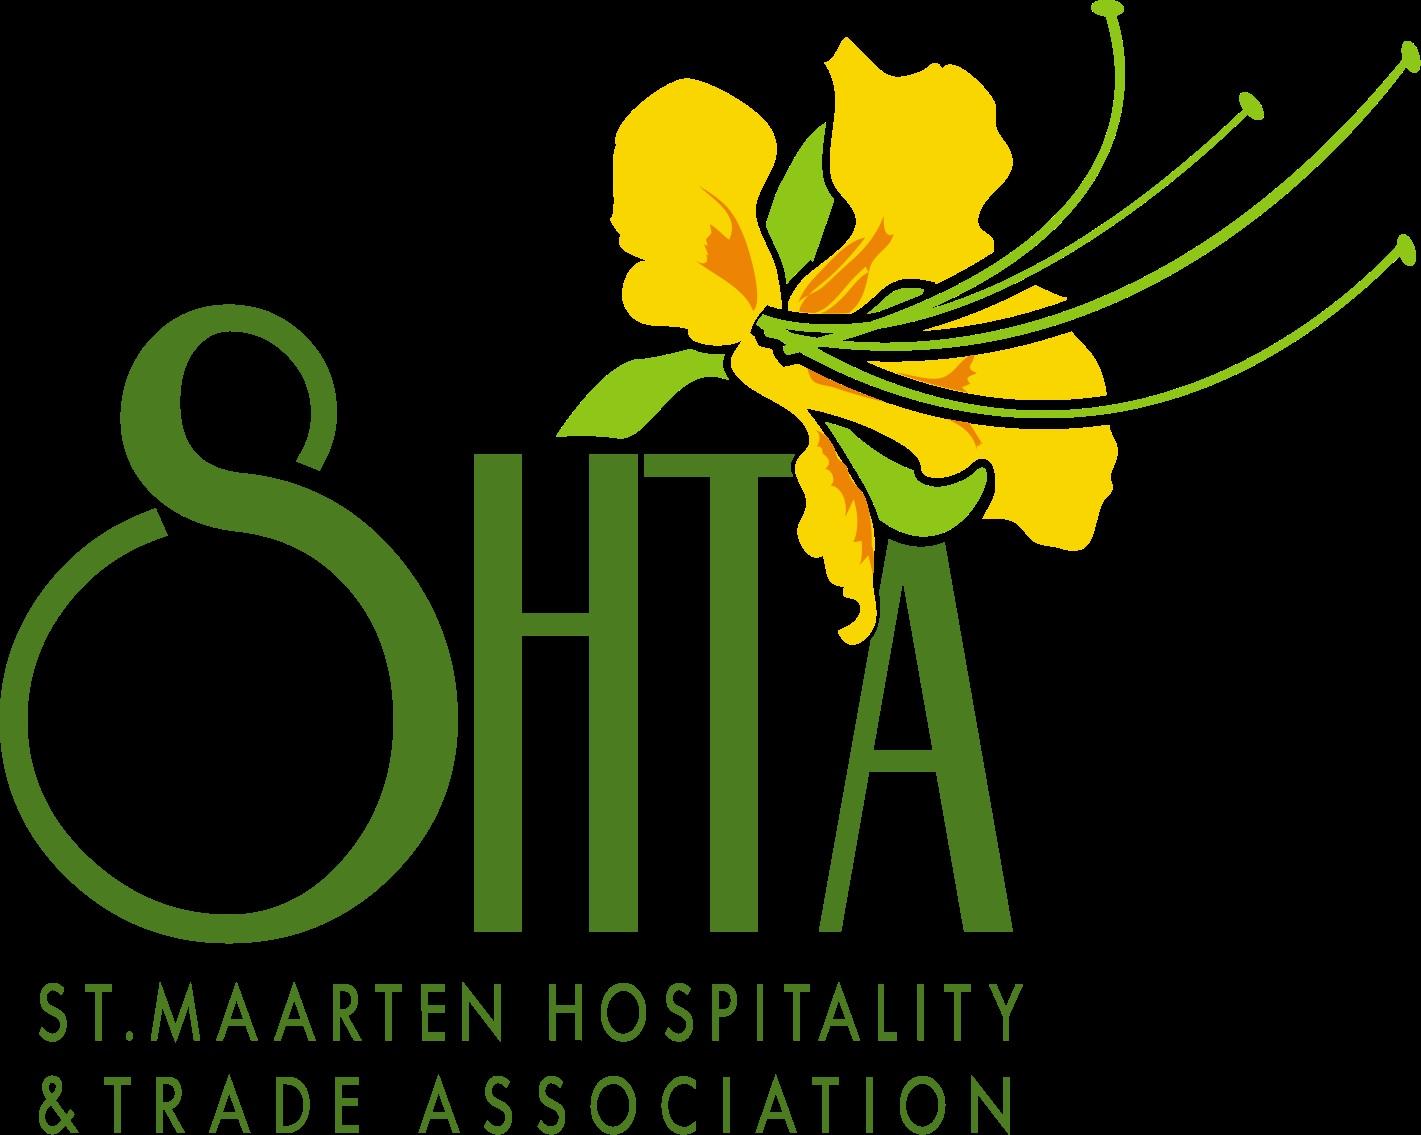 shta - Crystal Pineapple Awards